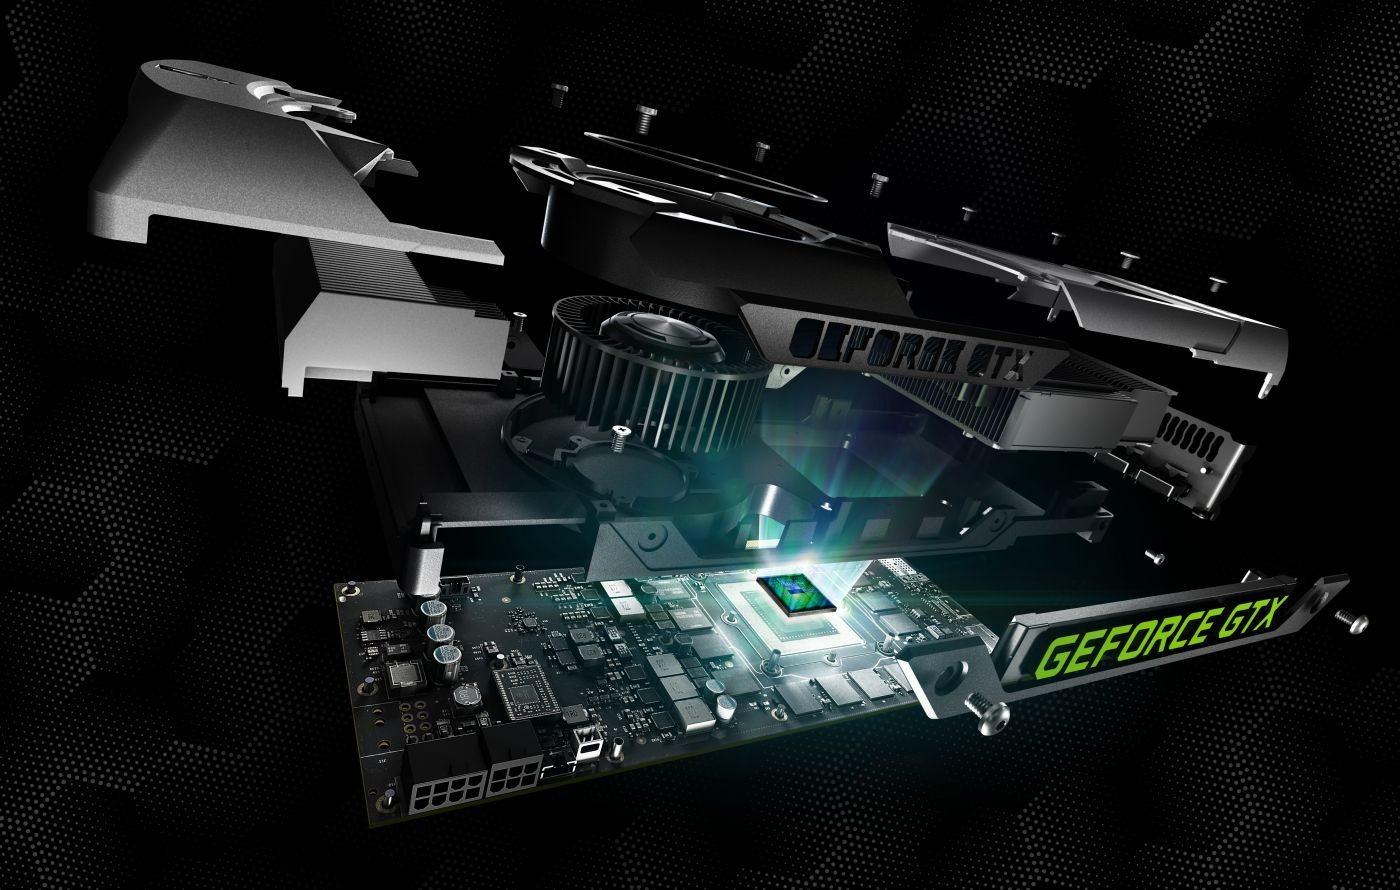 GeForce-GTX-780-Teardown